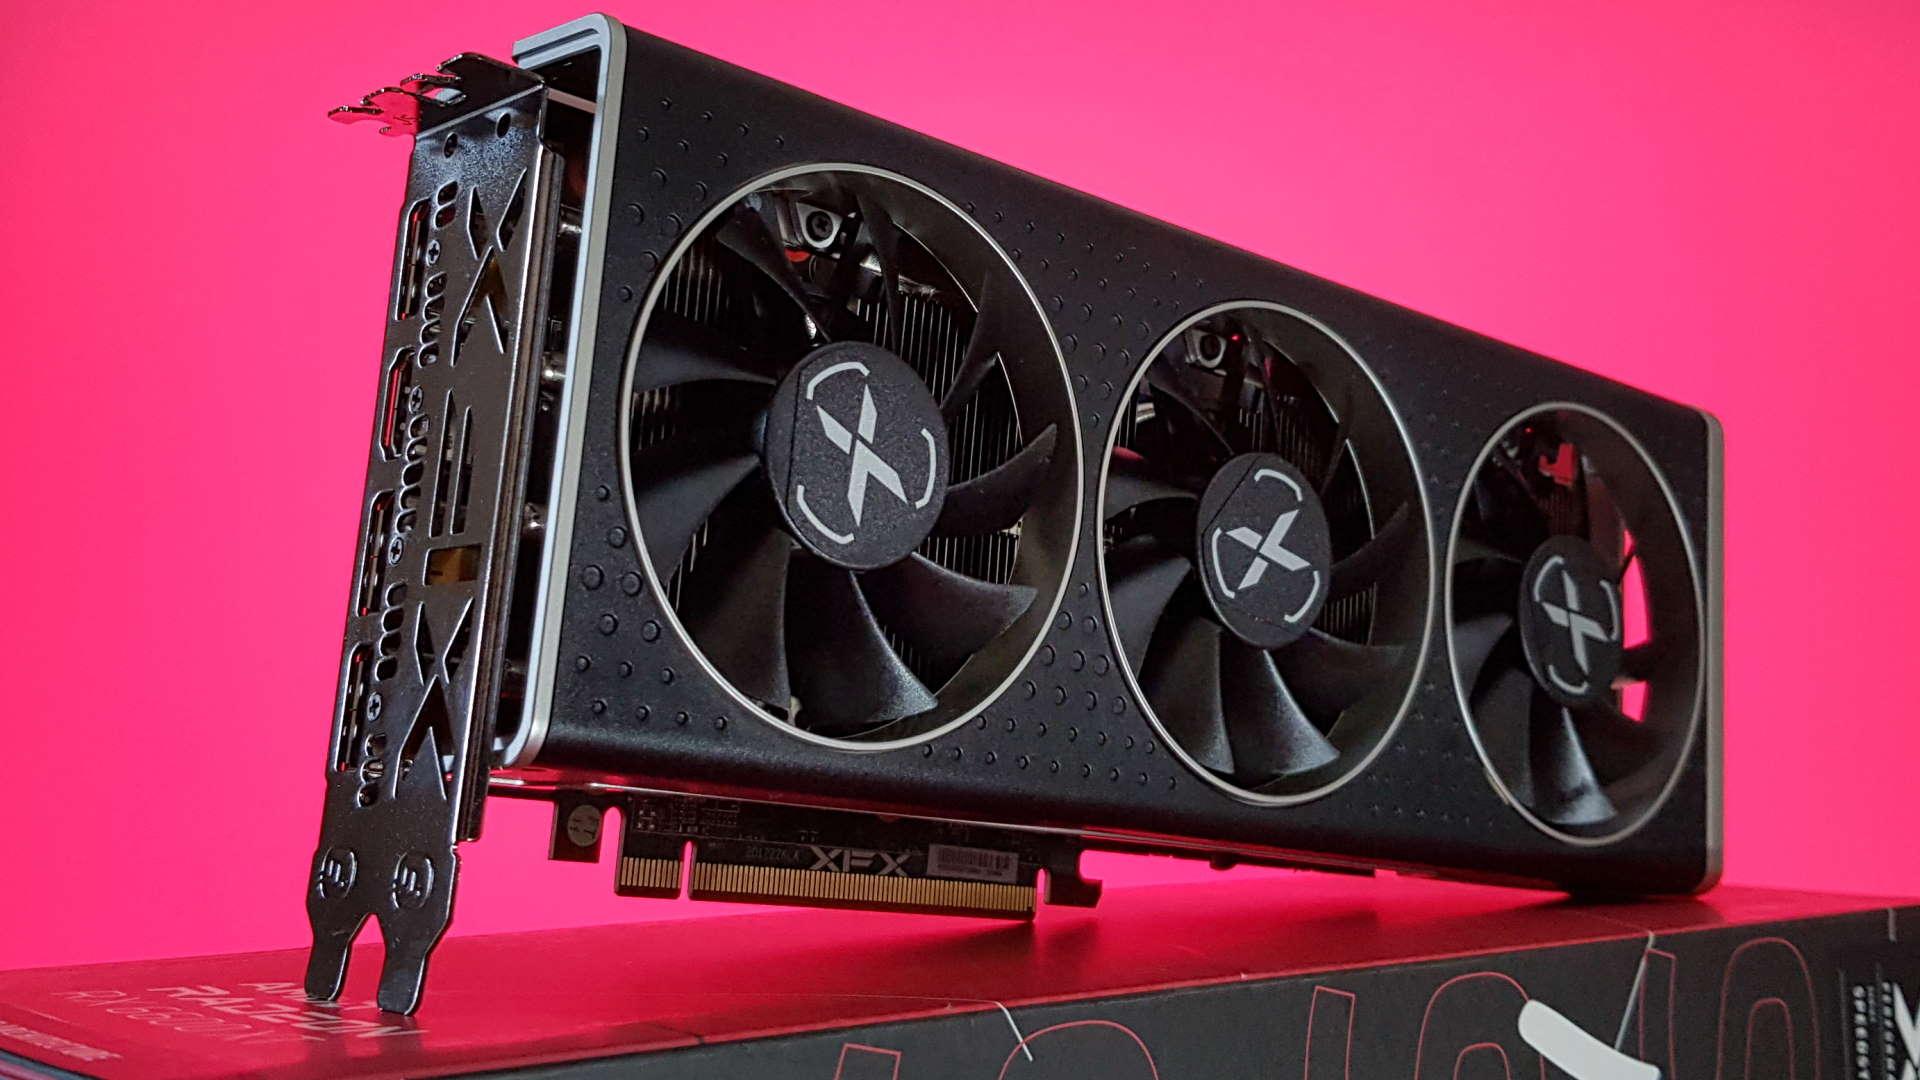 XFX Radeon RX 6600 XT graphics card